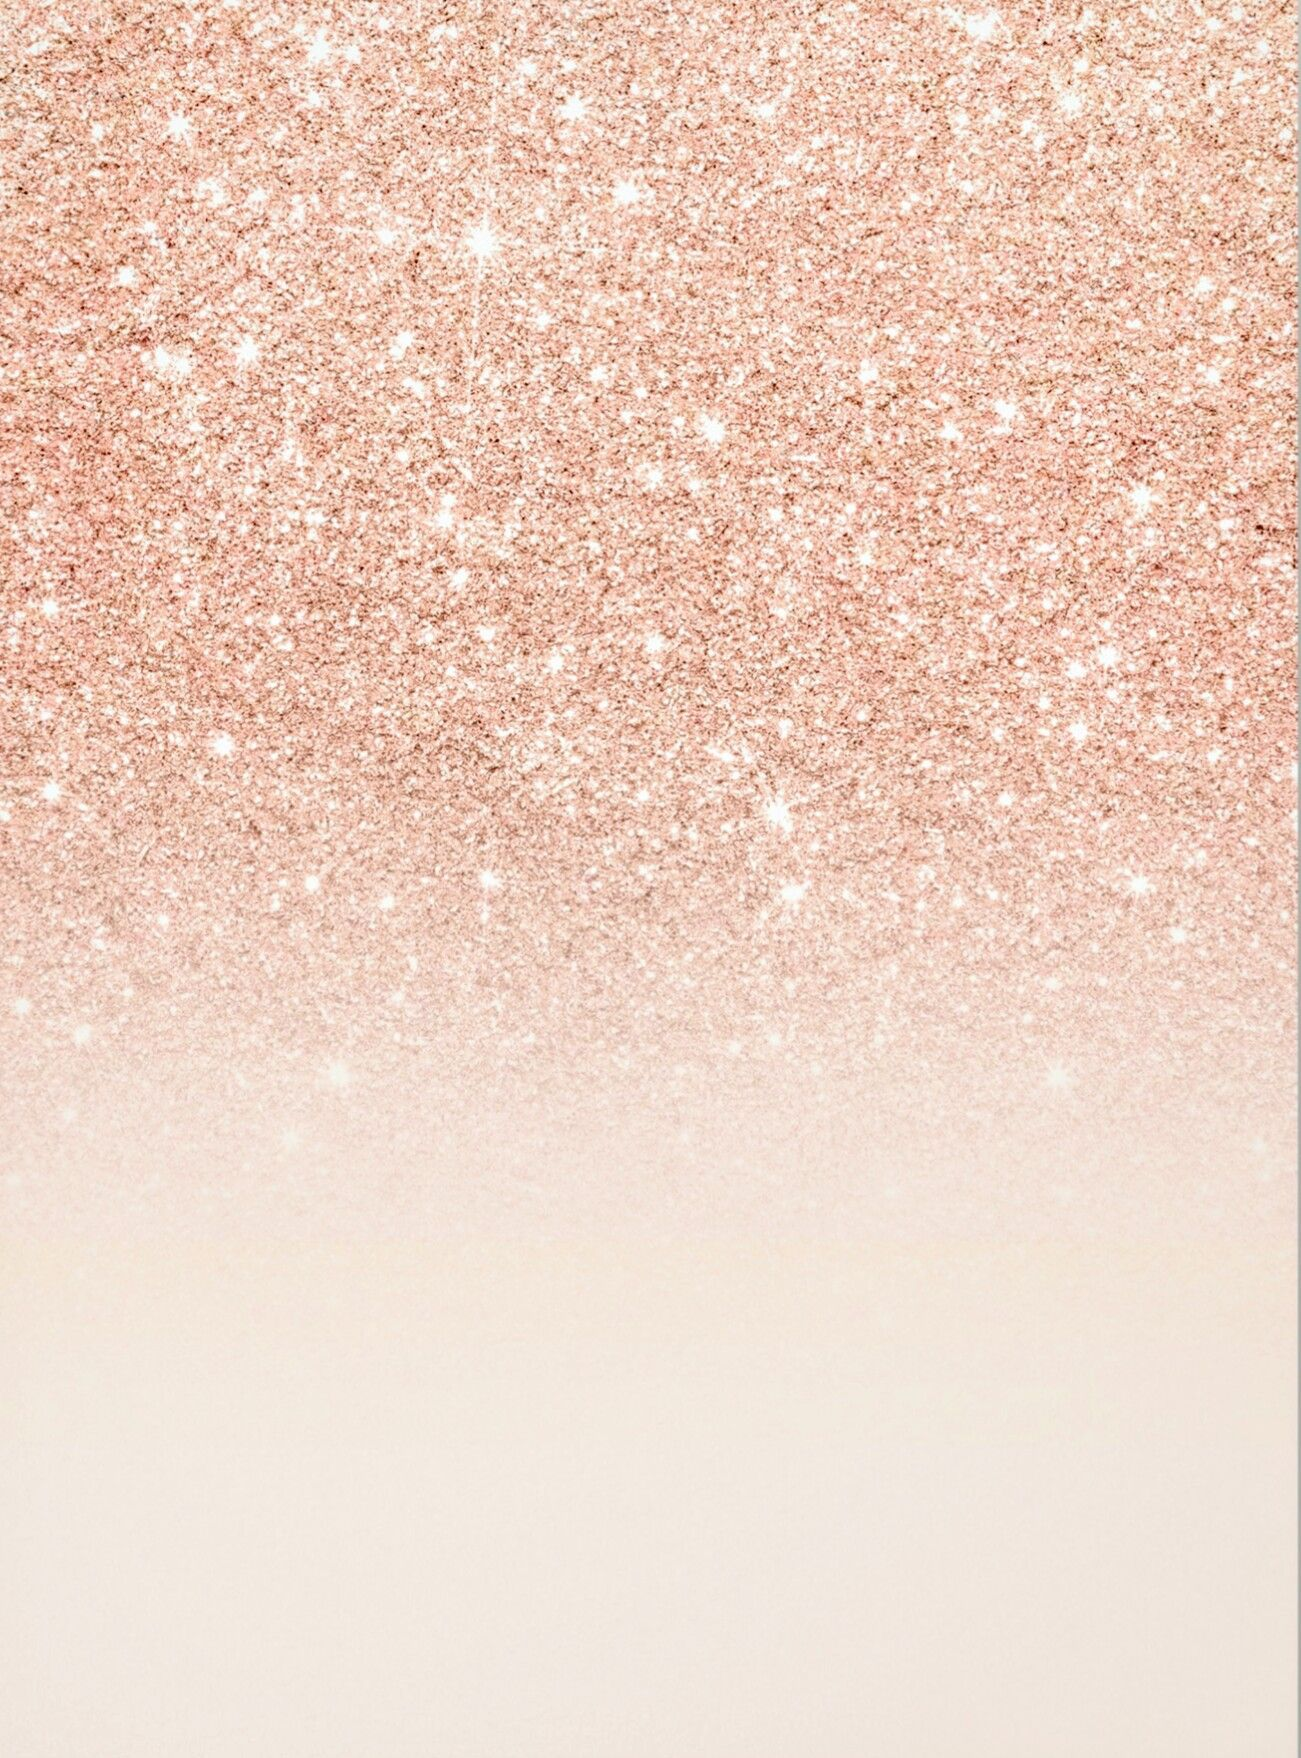 Pinterest Xosarahxbethxo Wallpapyer V 2019 G Screen Wa Gold Wallpaper Background Rose Gold Glitter Wallpaper Rose Gold Wallpaper